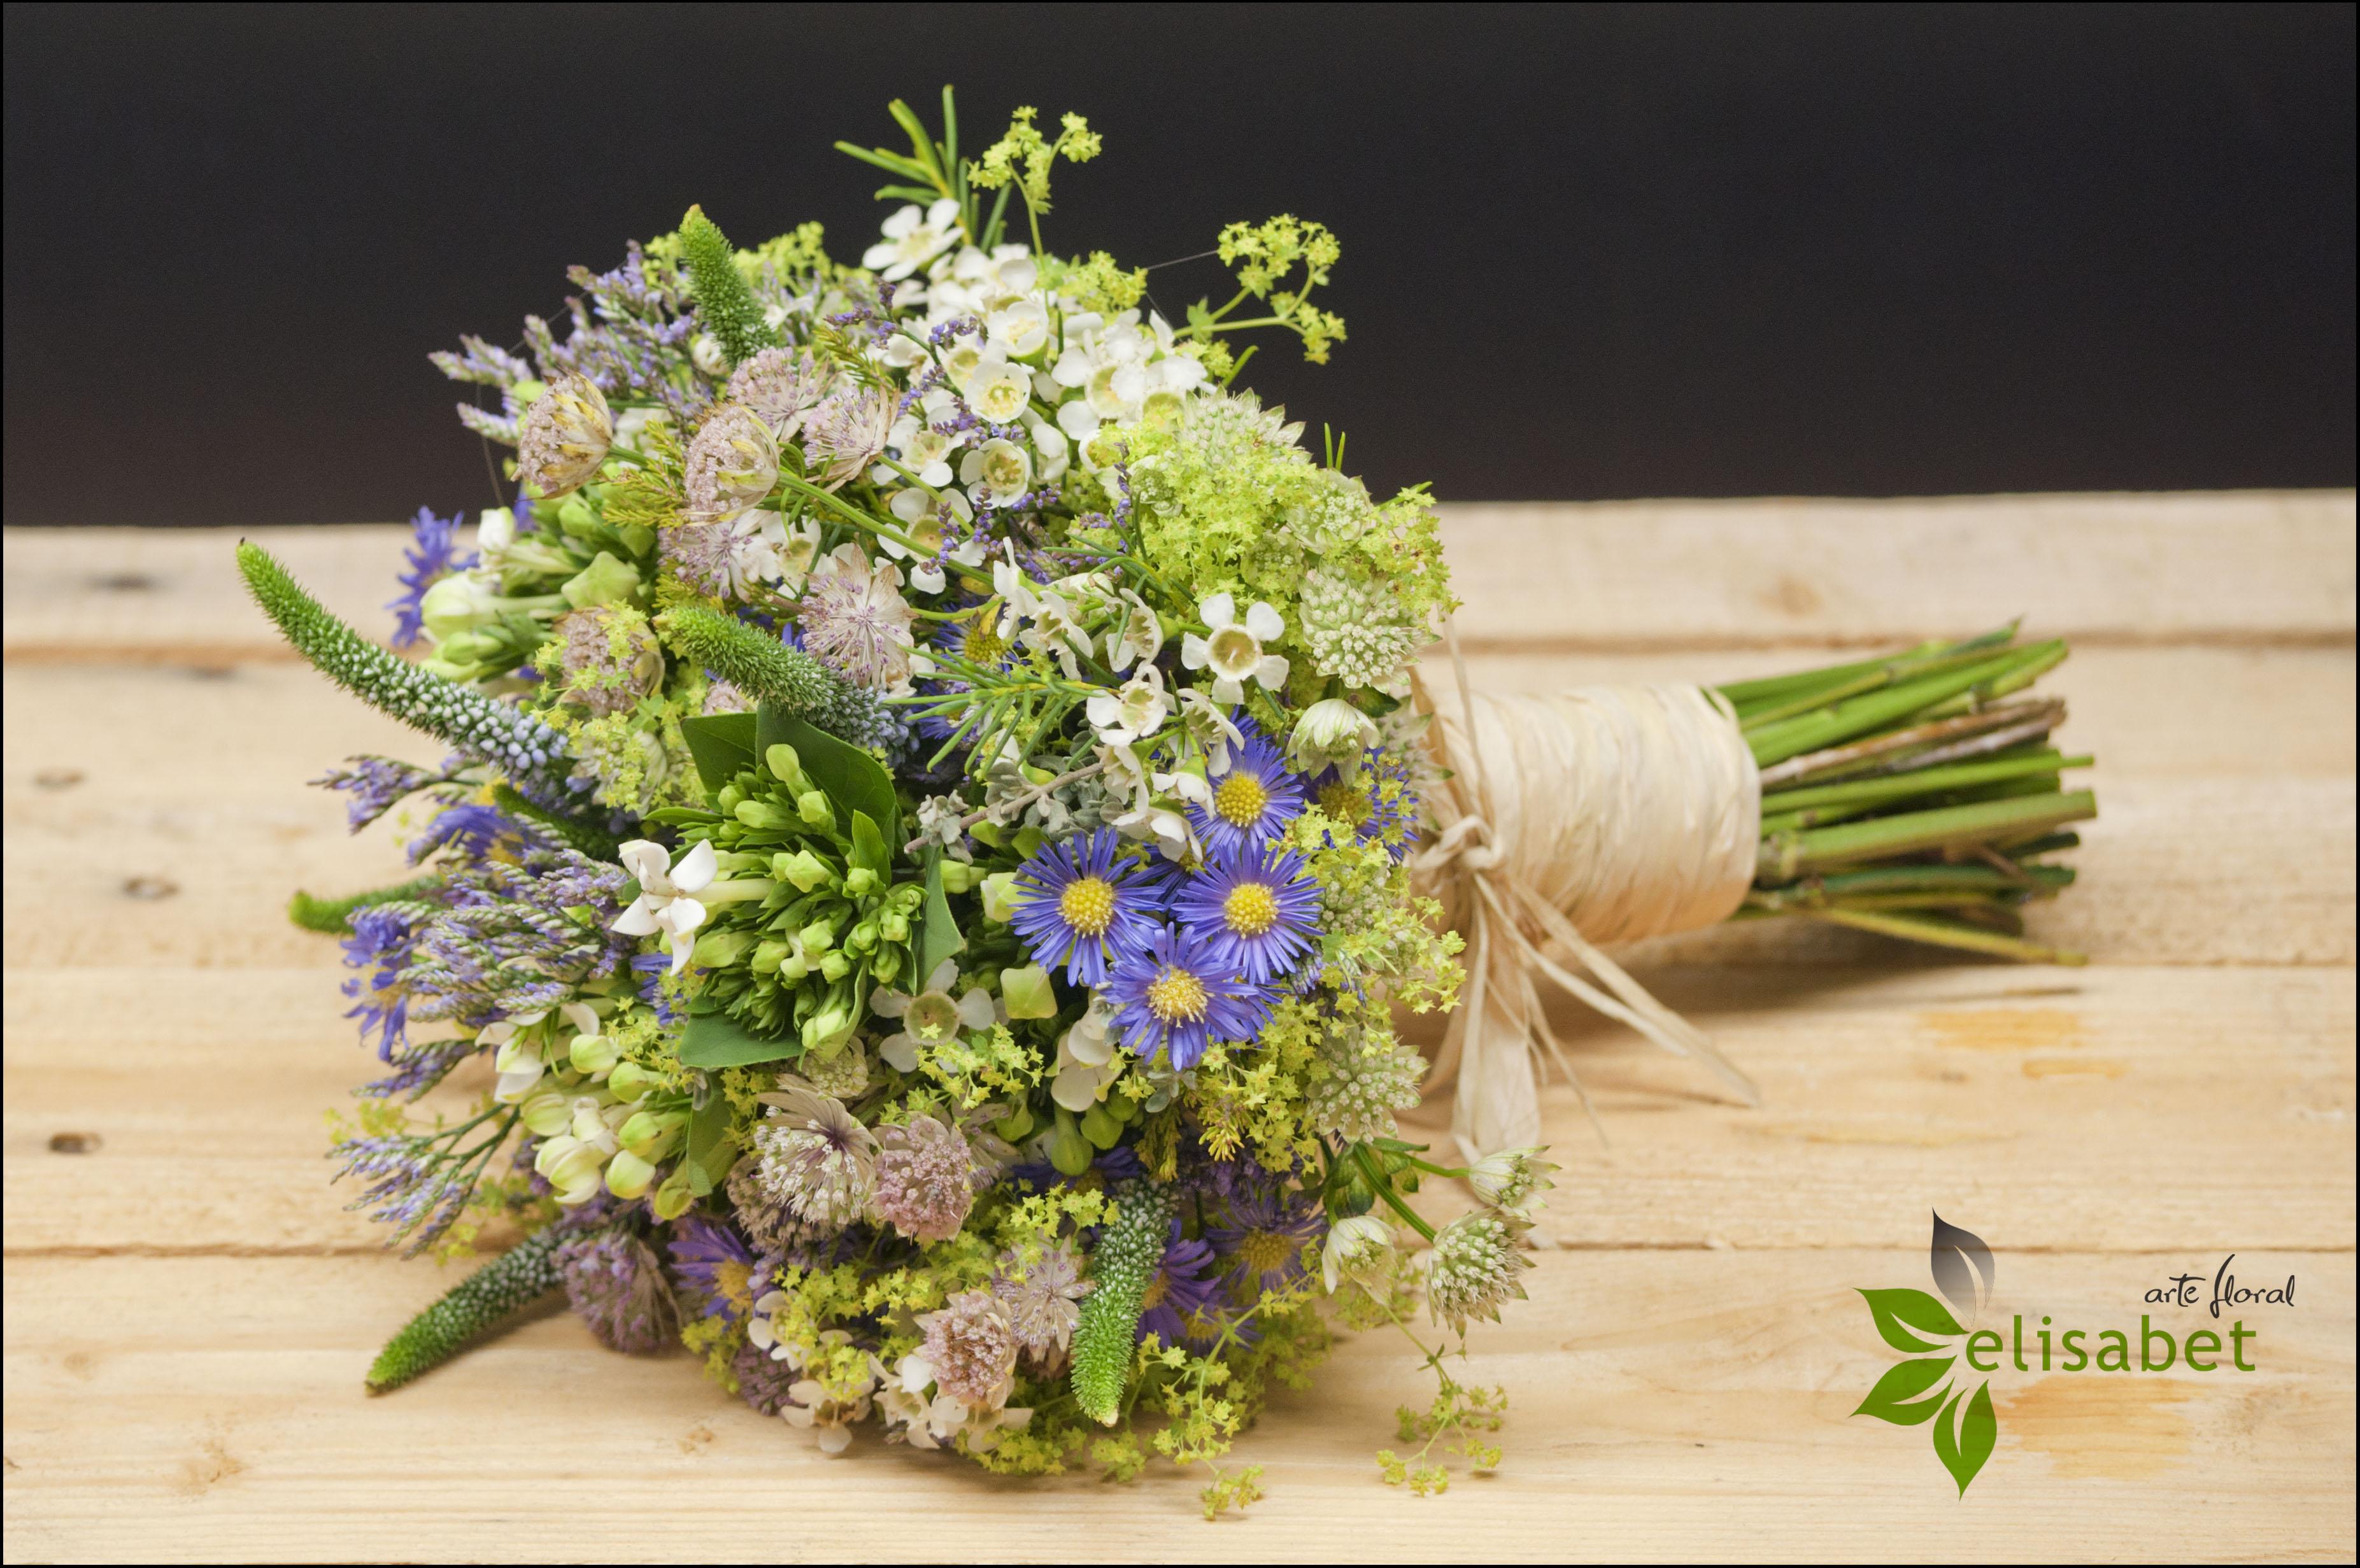 Ramo De Novia Flores Silvestres Elisabet Arte Floral Elisabet Arte